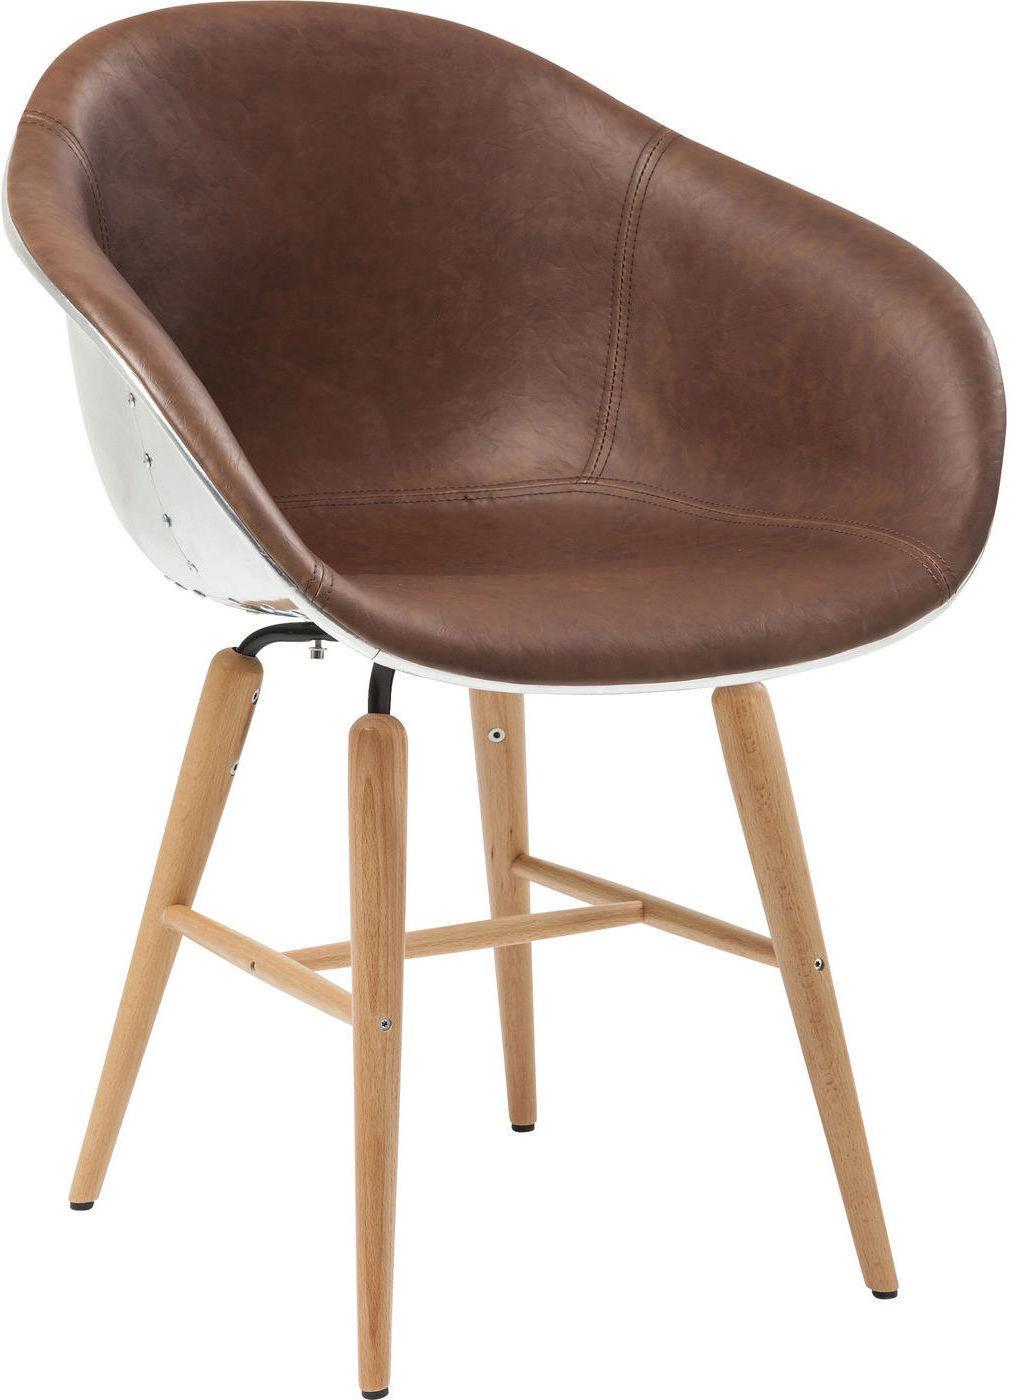 Stuhl forum soho braun mit armlehne kare design for Stuhl mit armlehne design